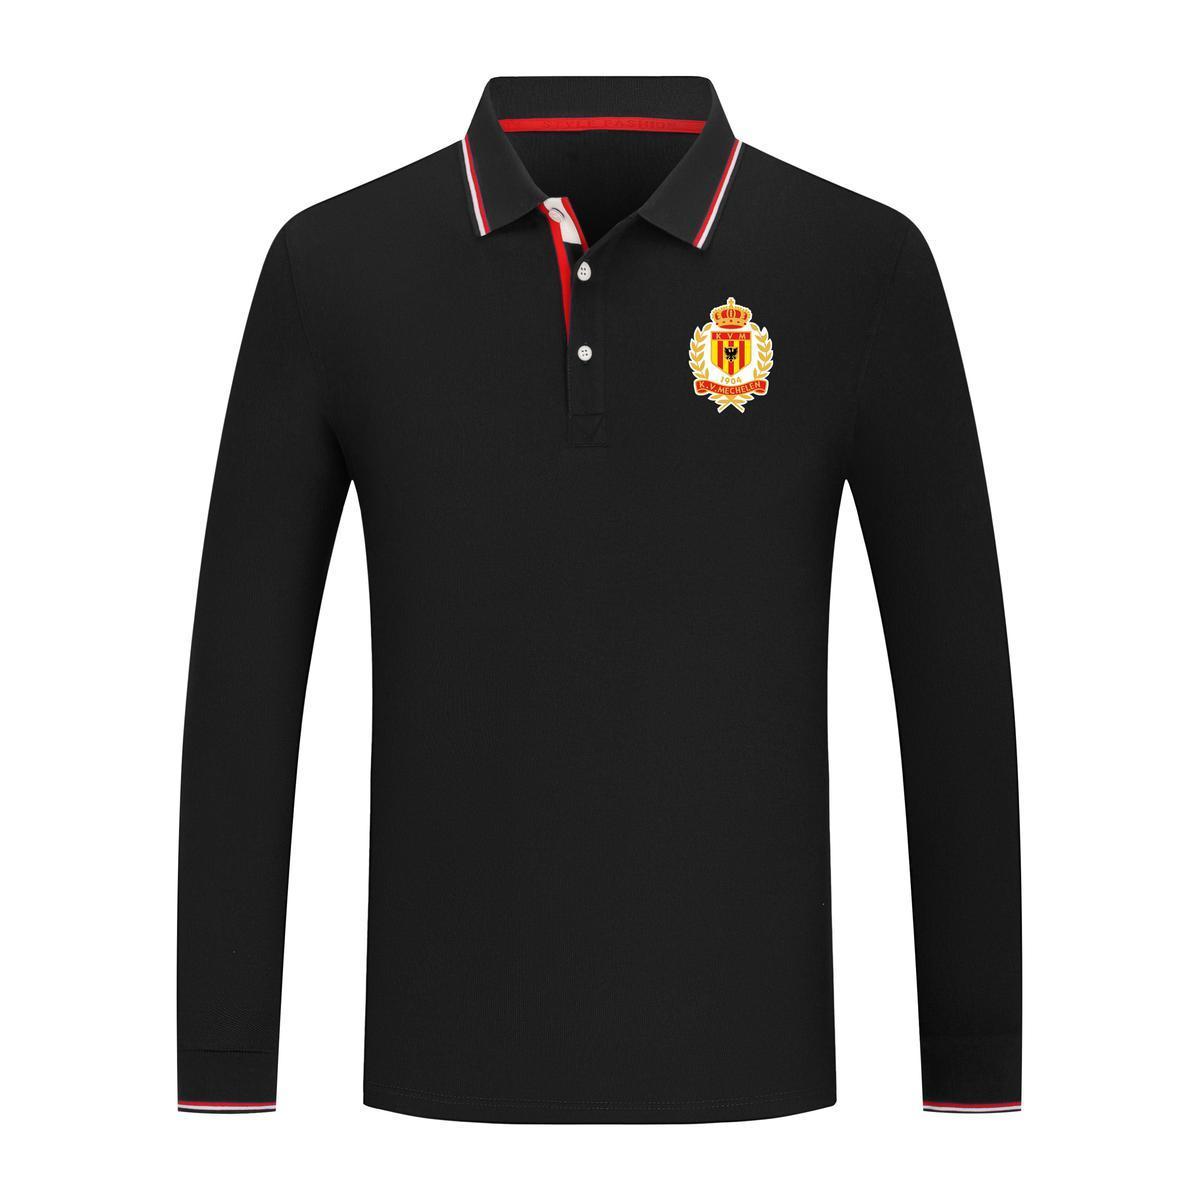 2021 KV Mechelen Nuevo manga larga solapa deportiva polo camisa algodón color puro ocasional hombre camisa de polo de alta calidad Serie de golf Jersey